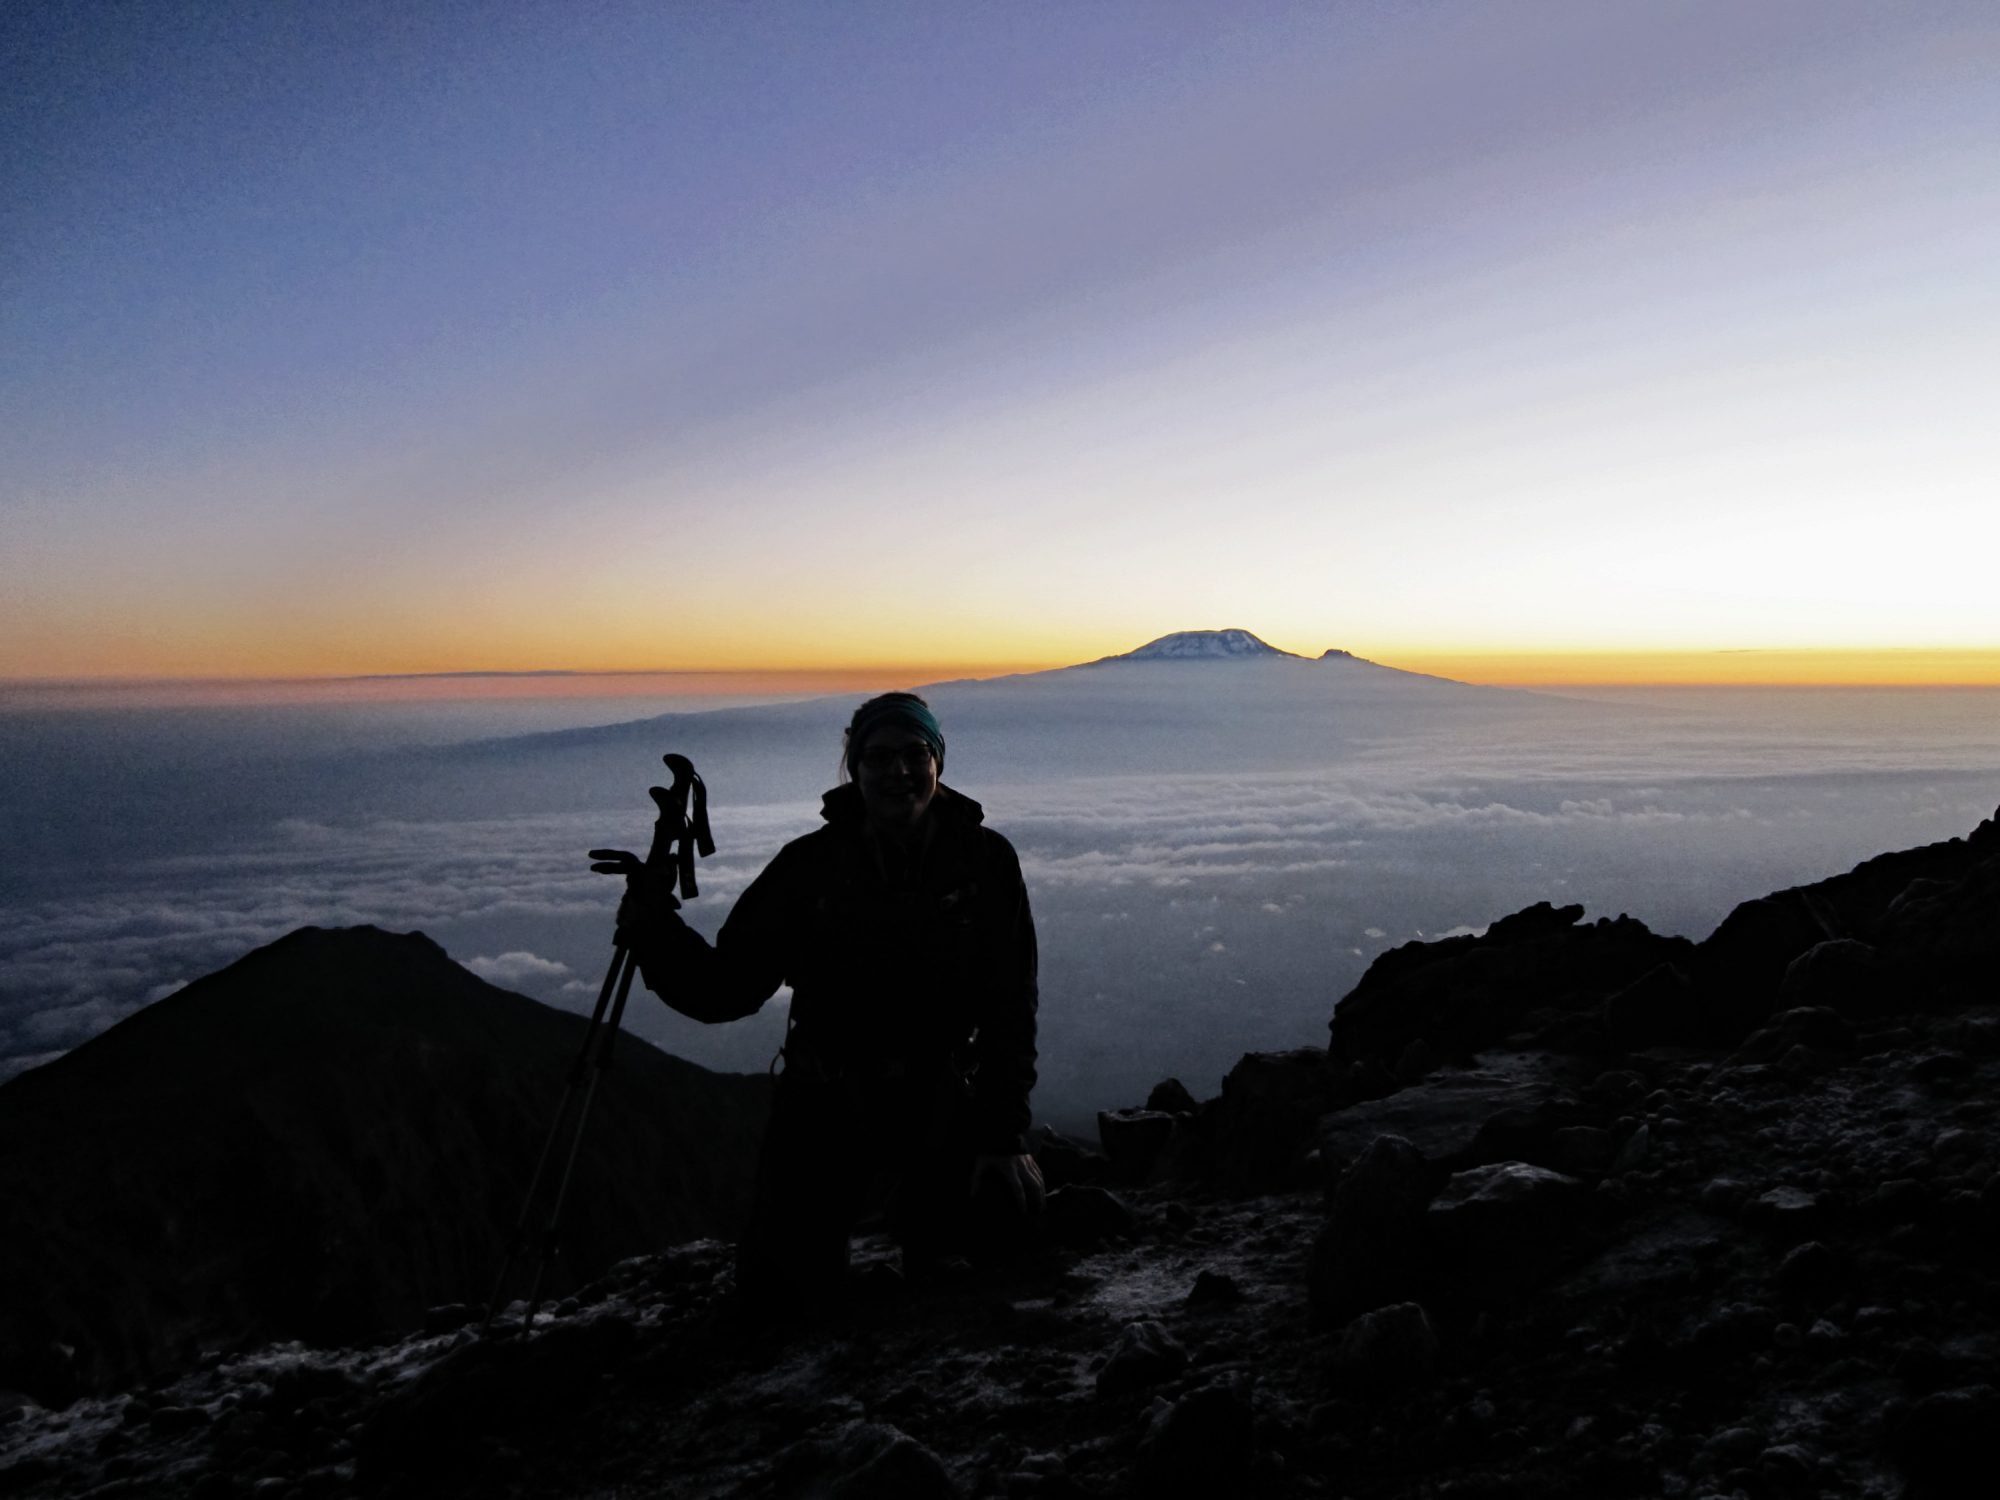 Sonnenaufgang mit Blick auf den Kilimandscharo am Mount Meru, Regenwald, Arusha Nationalpark, Tansania, Afrika